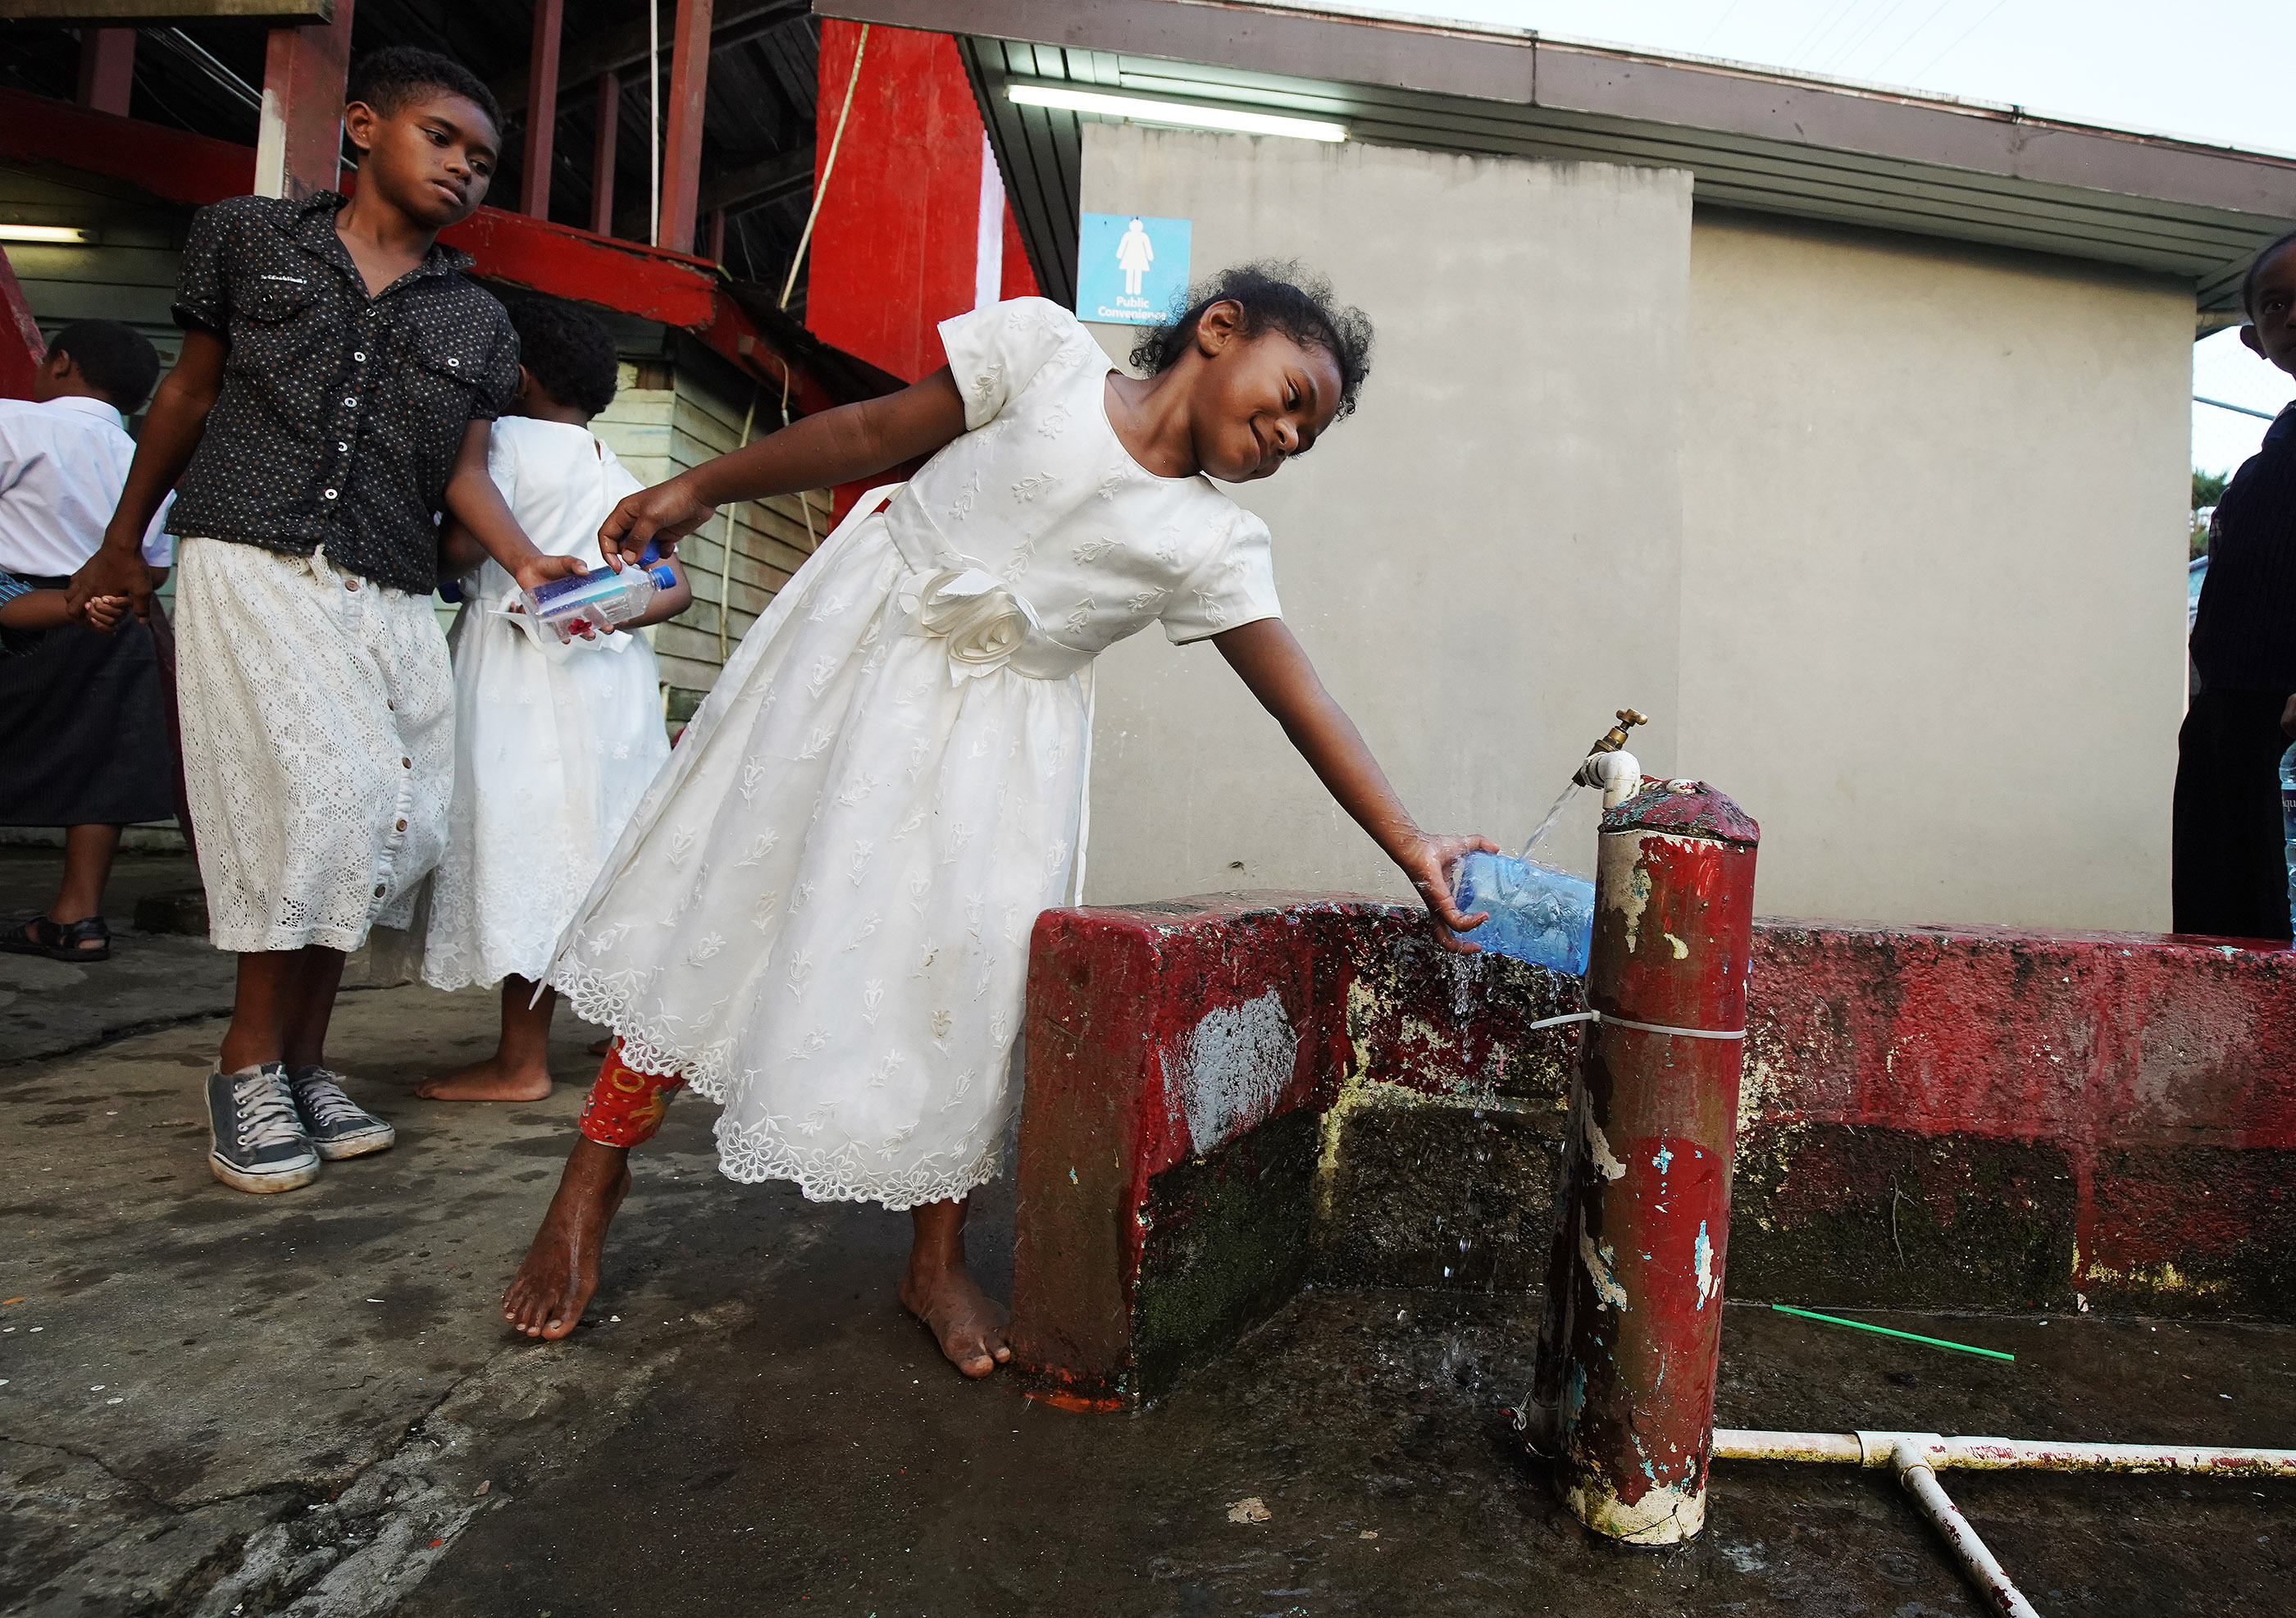 Crystal Rabukara gathers water during a devotional at Ratu Cakobau stadium in Nausori, Fiji on May 22, 2019.